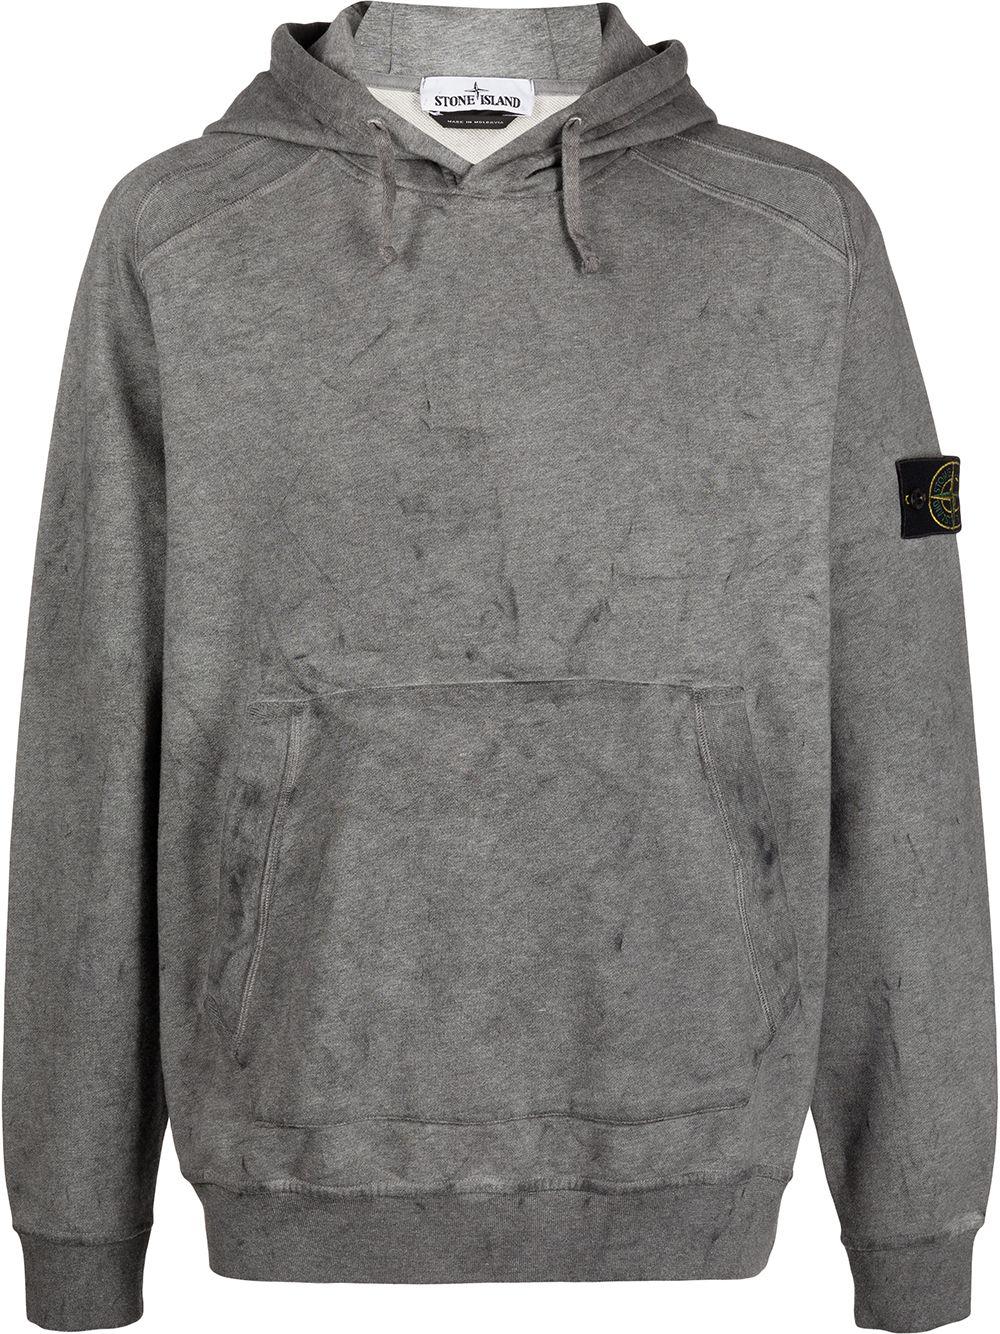 <p class='small-title'>STONE ISLAND</p>Sweatshirt